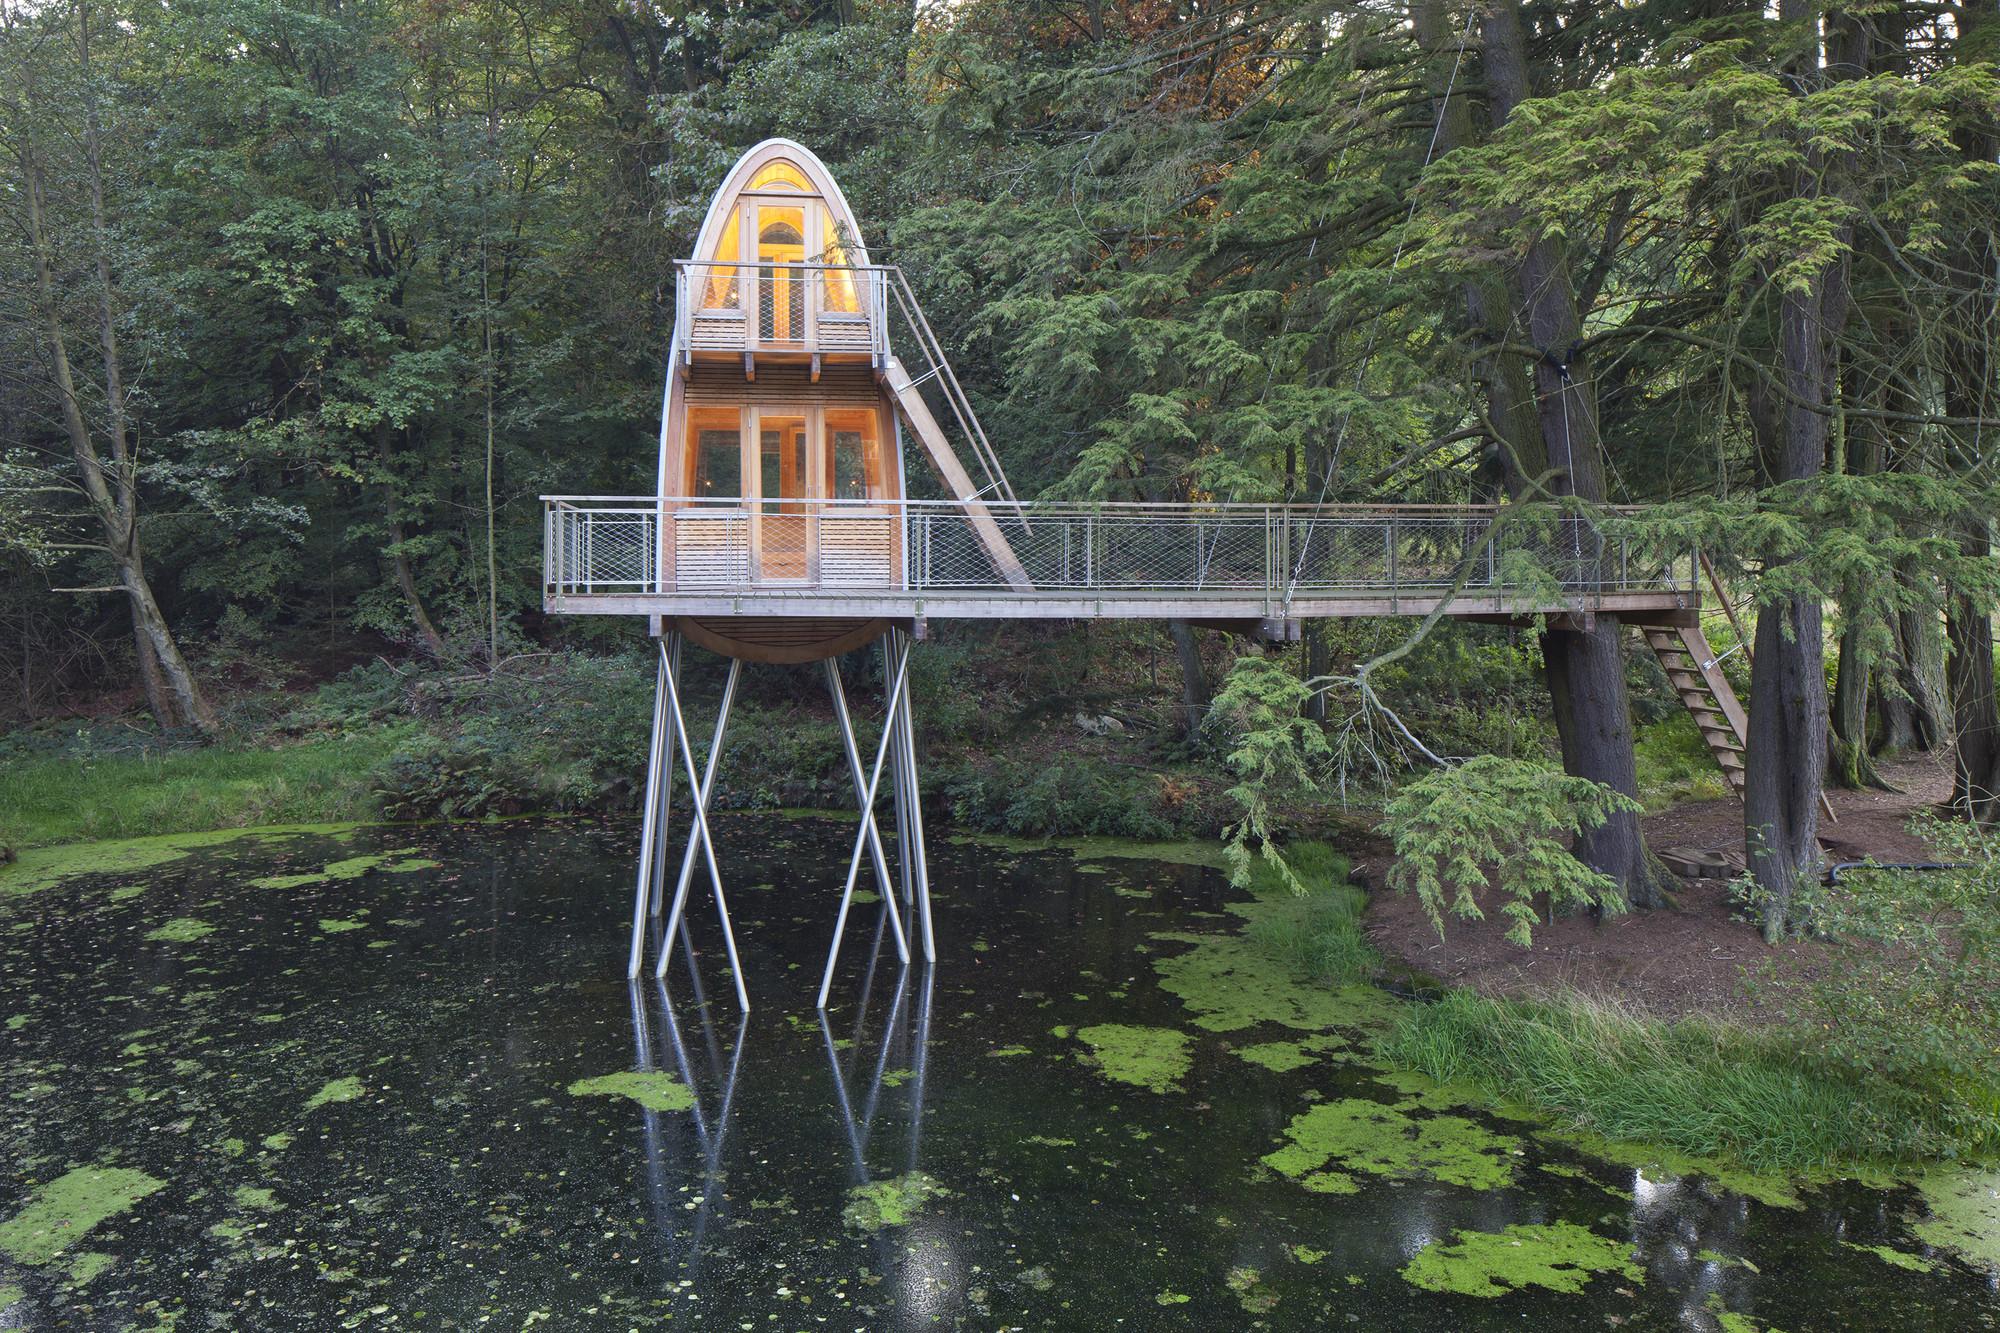 Treehouse Solling / baumraum, © Markus Bollen